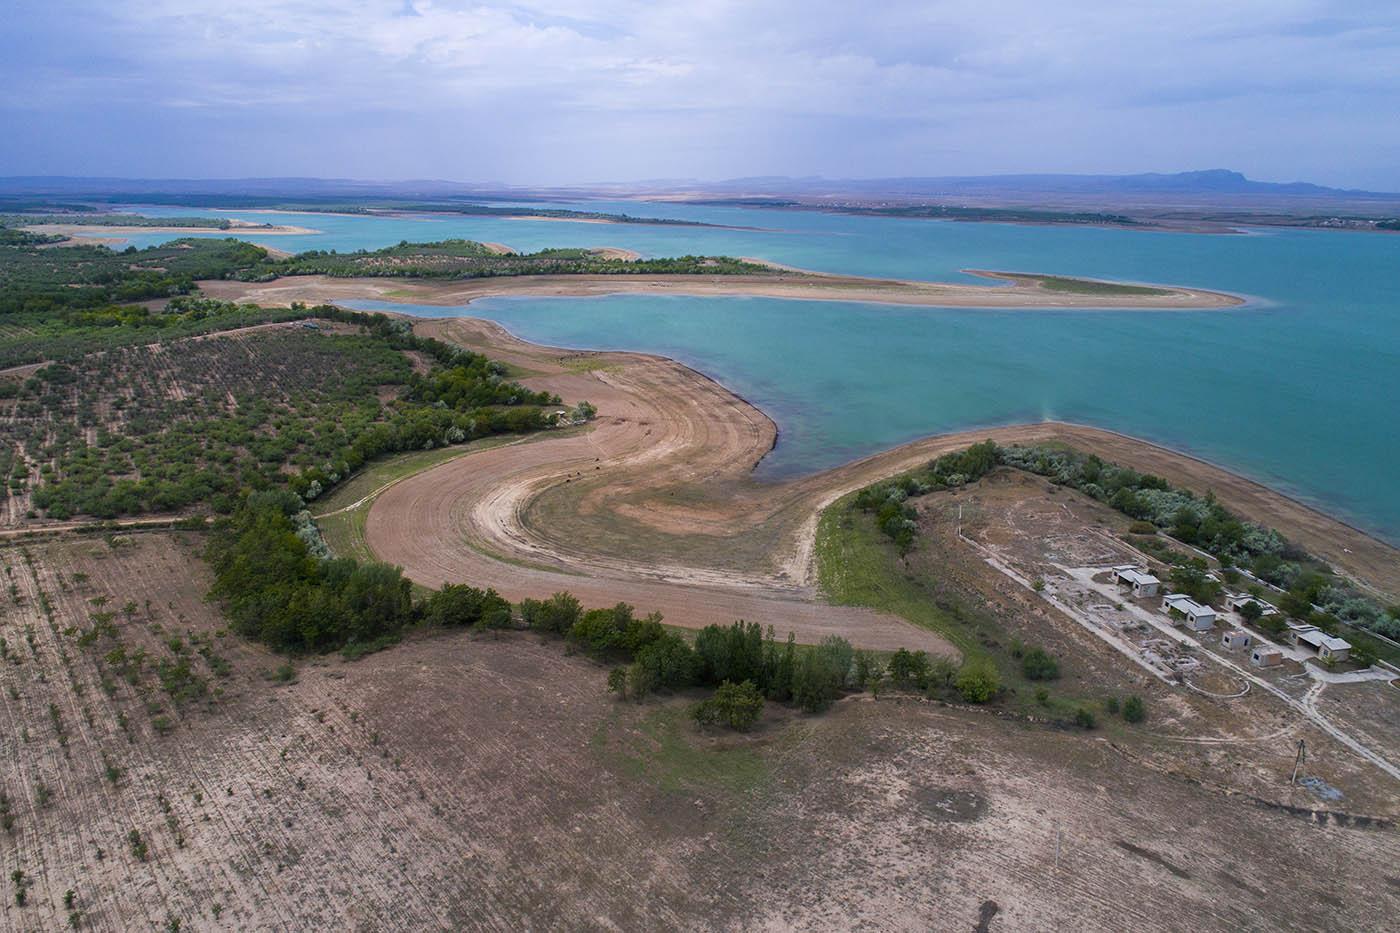 Узбекистан, сад, водохранилище, аэро, дрон, aerial, Борис Резванцев